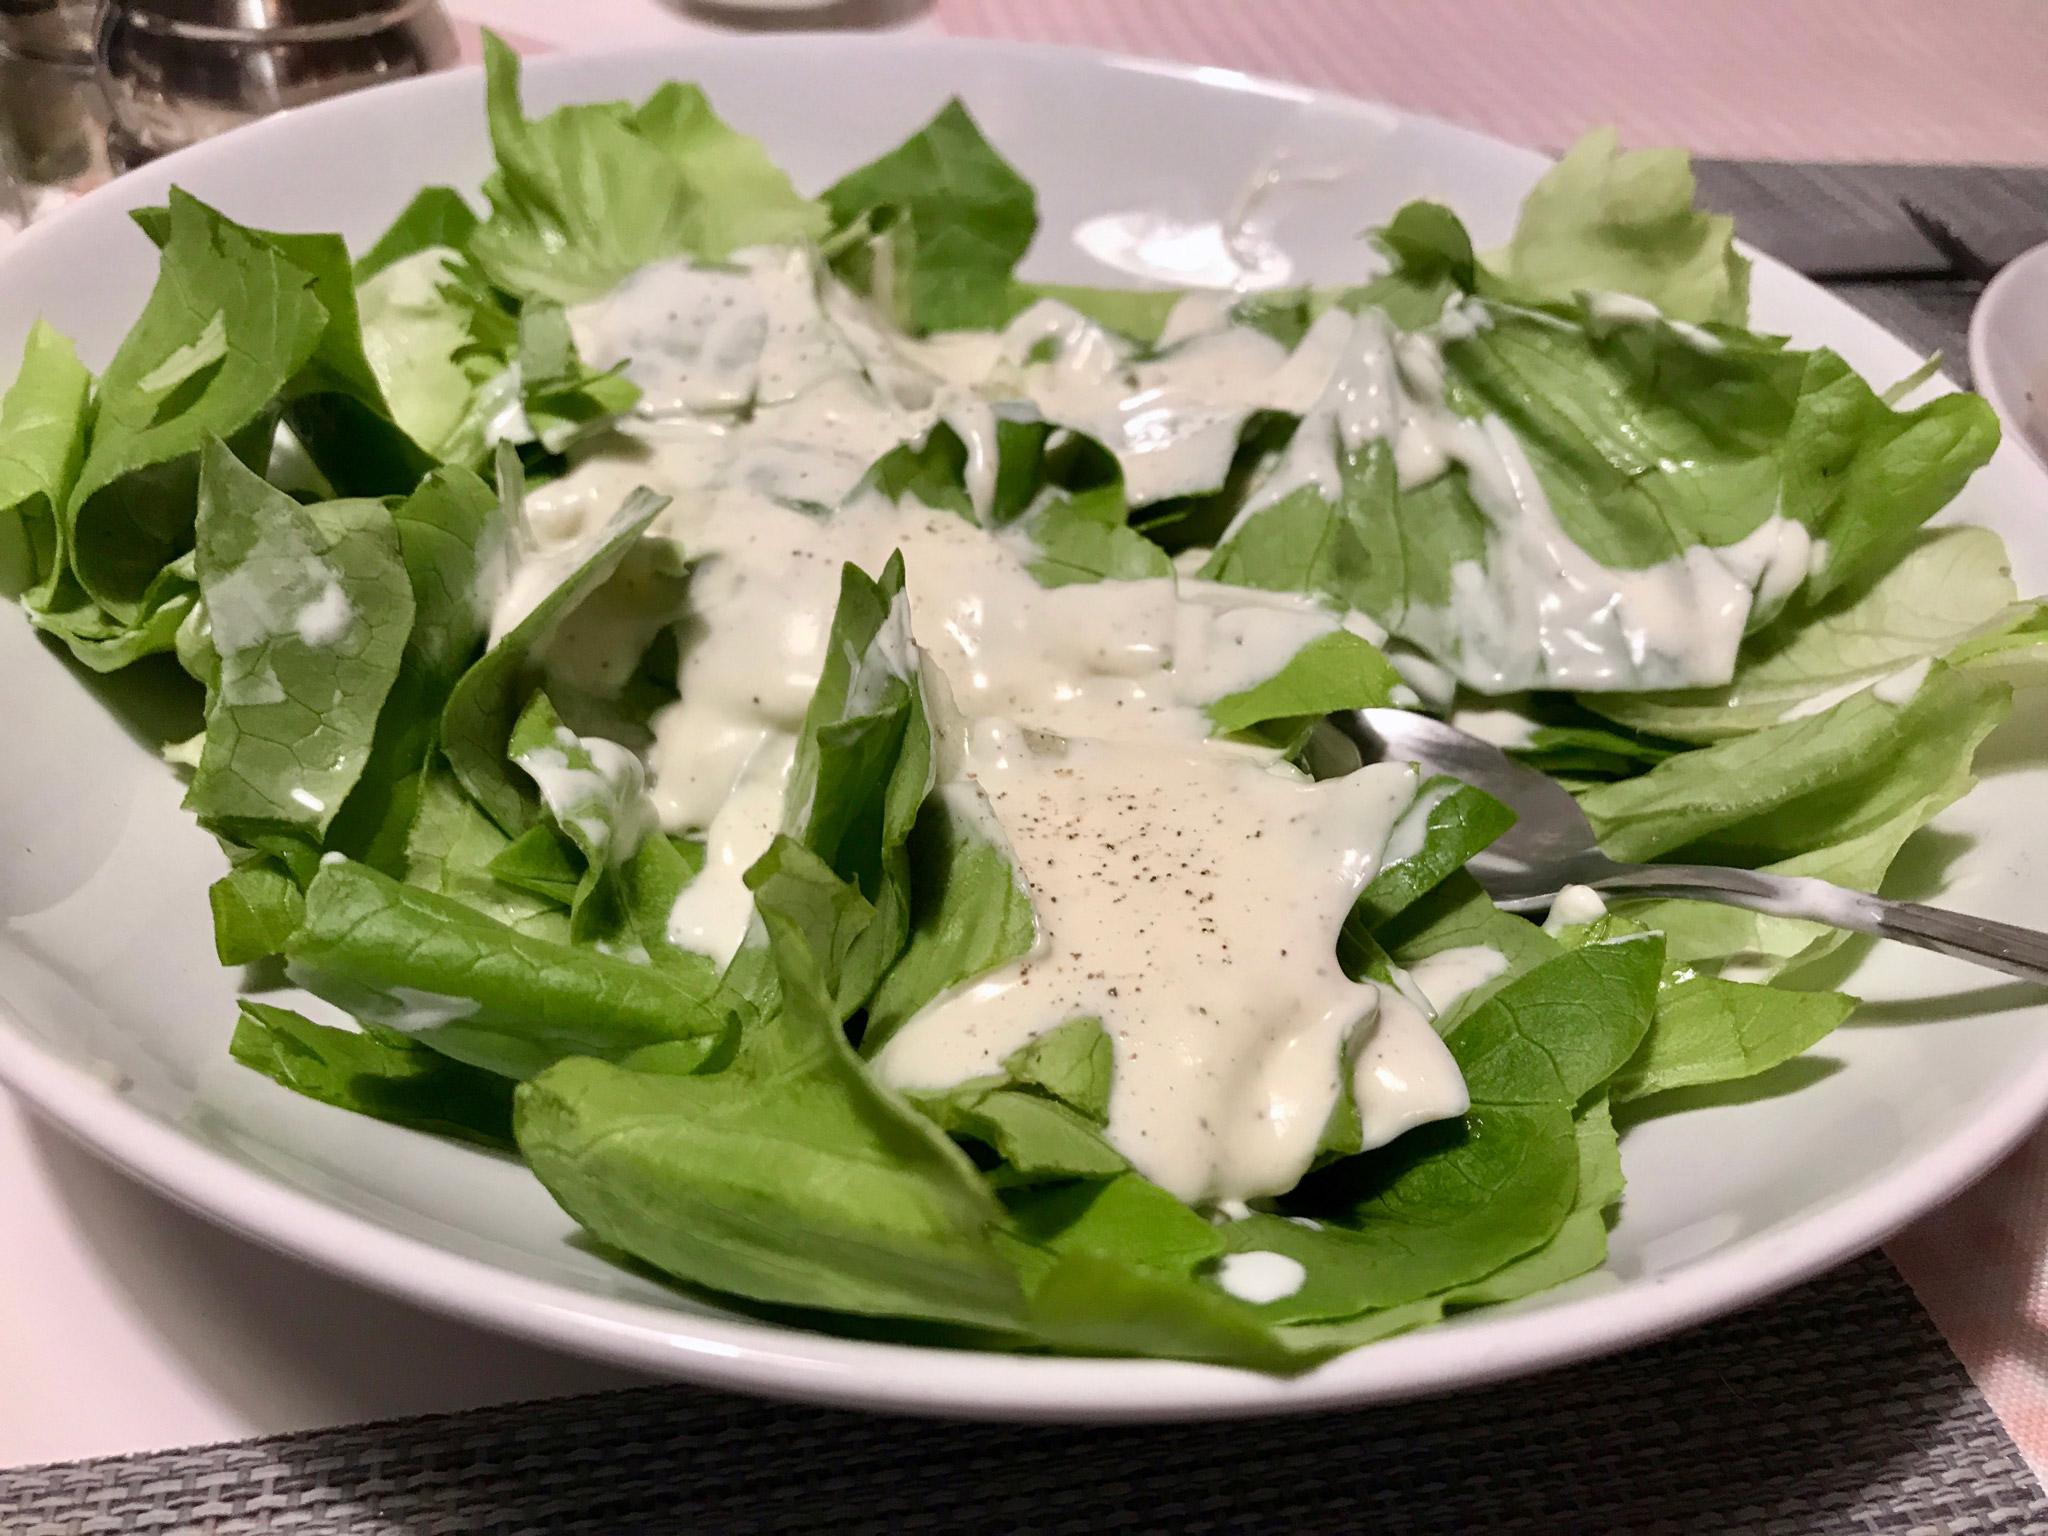 Kopfsalat mit leckerem Zitronen-Sahnedressing